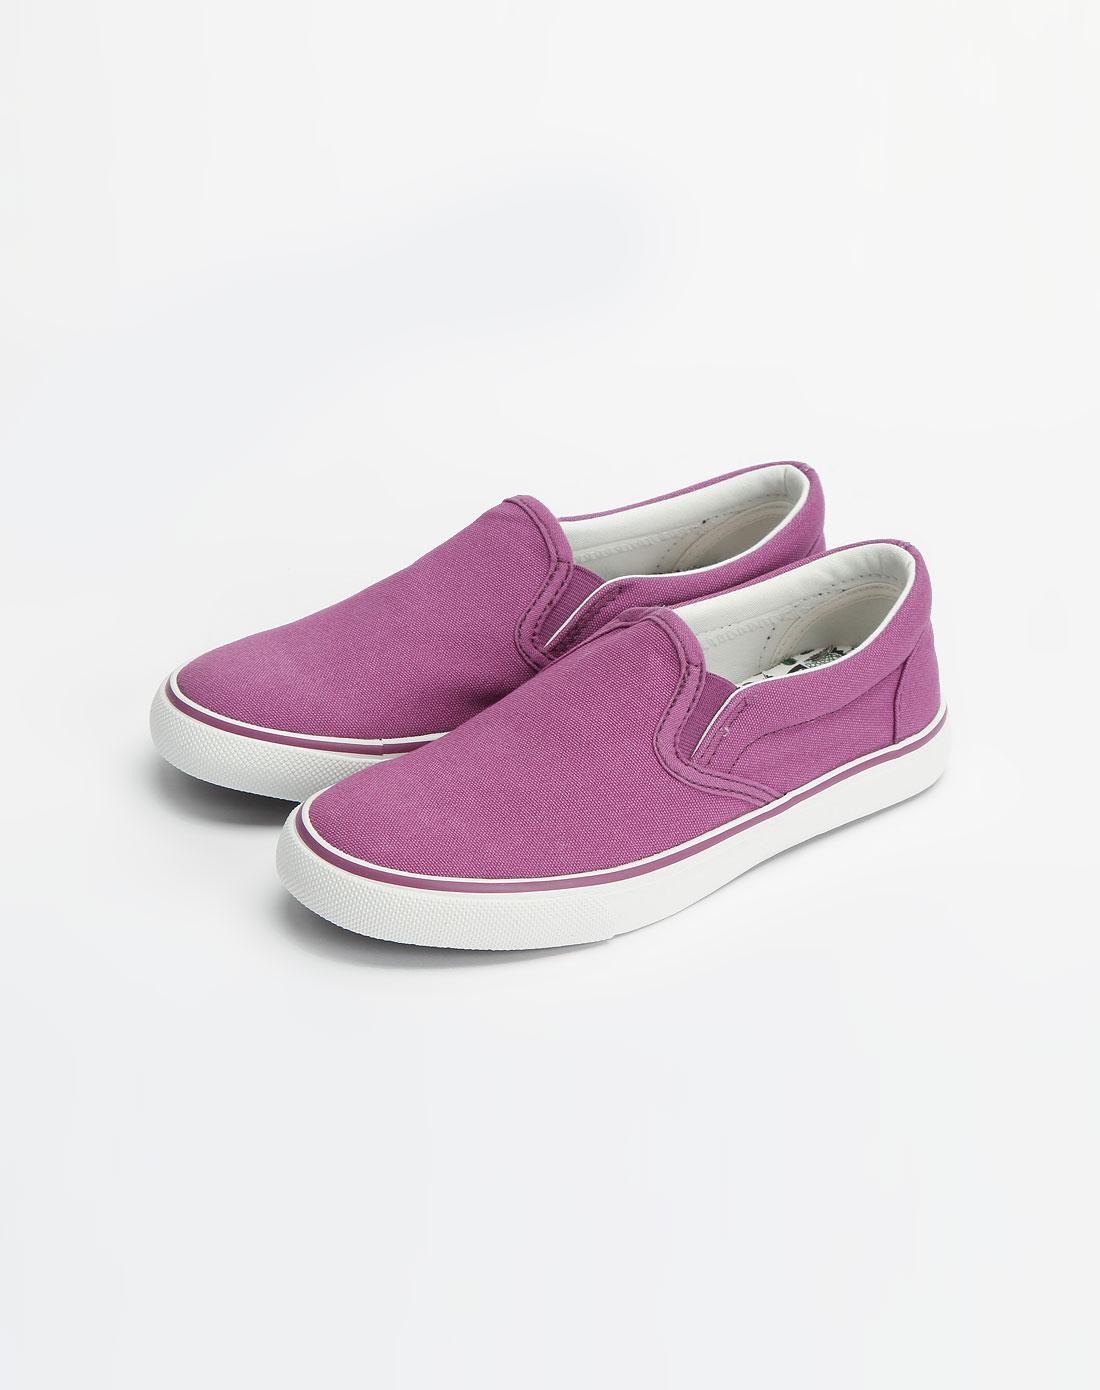 ampm 紫色简约休闲鞋